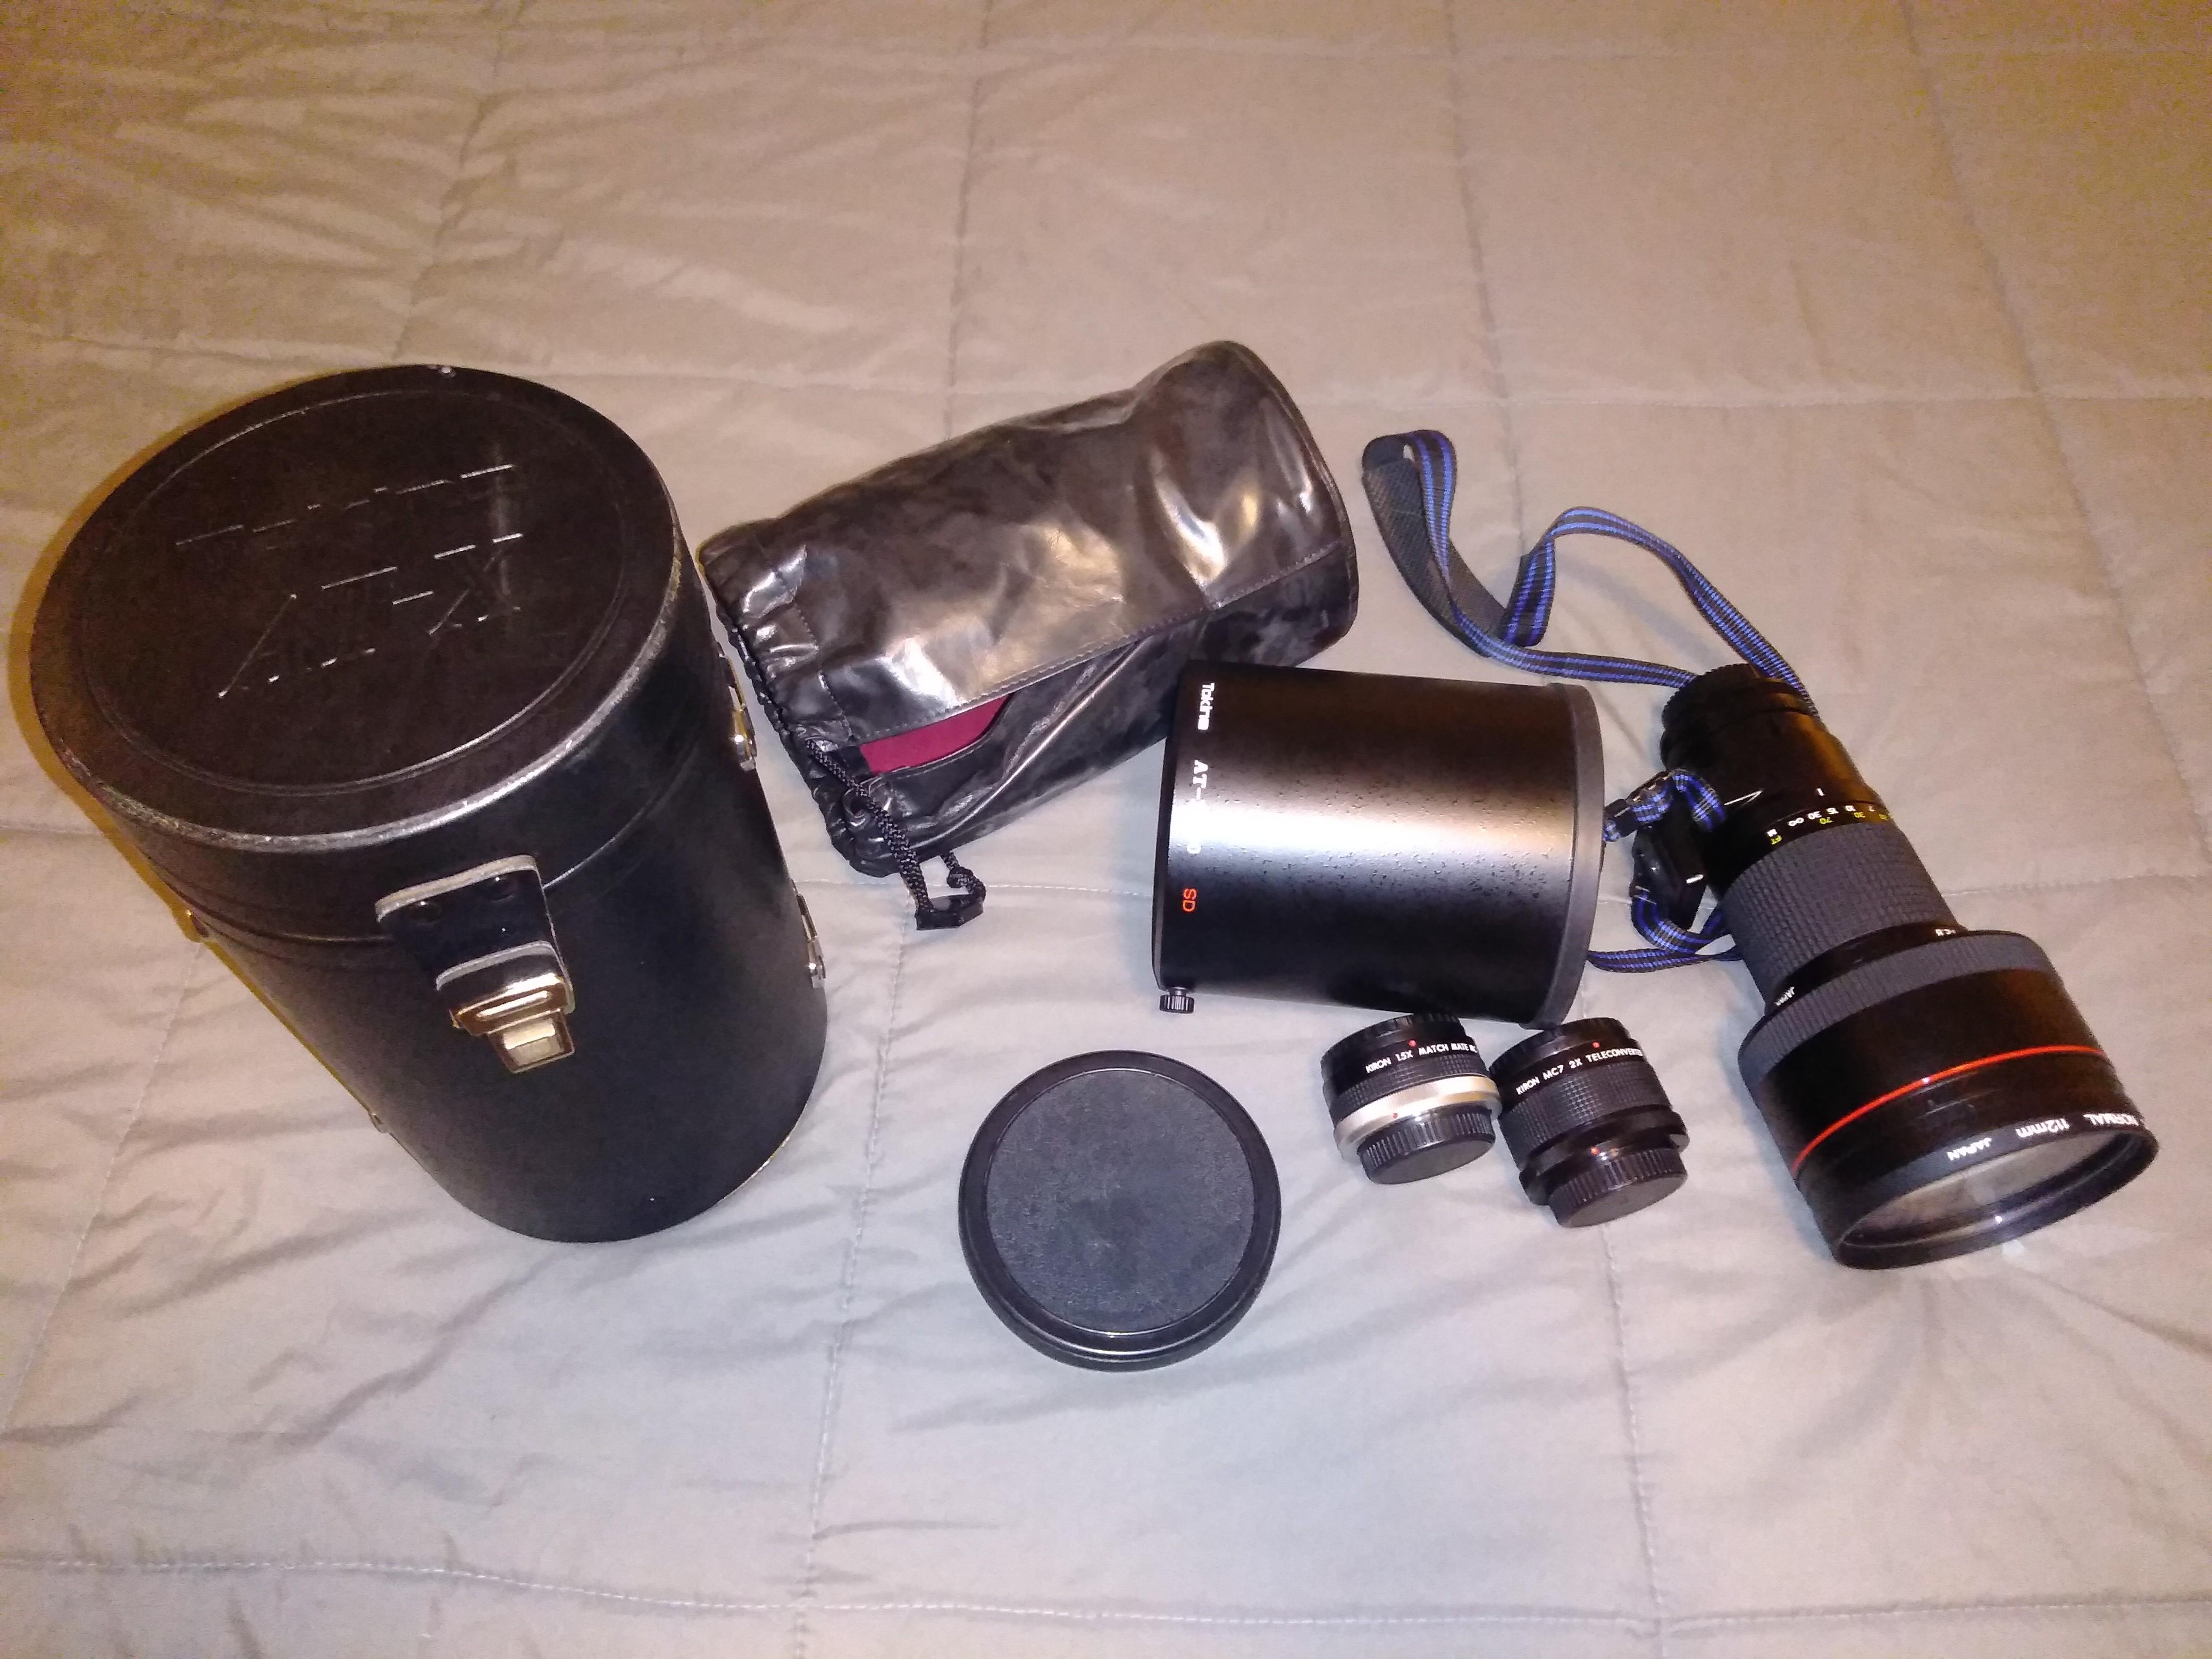 Tokina AT-X SD 300mm f/2 8 MF Lens w/2 teleconverters - FD mount